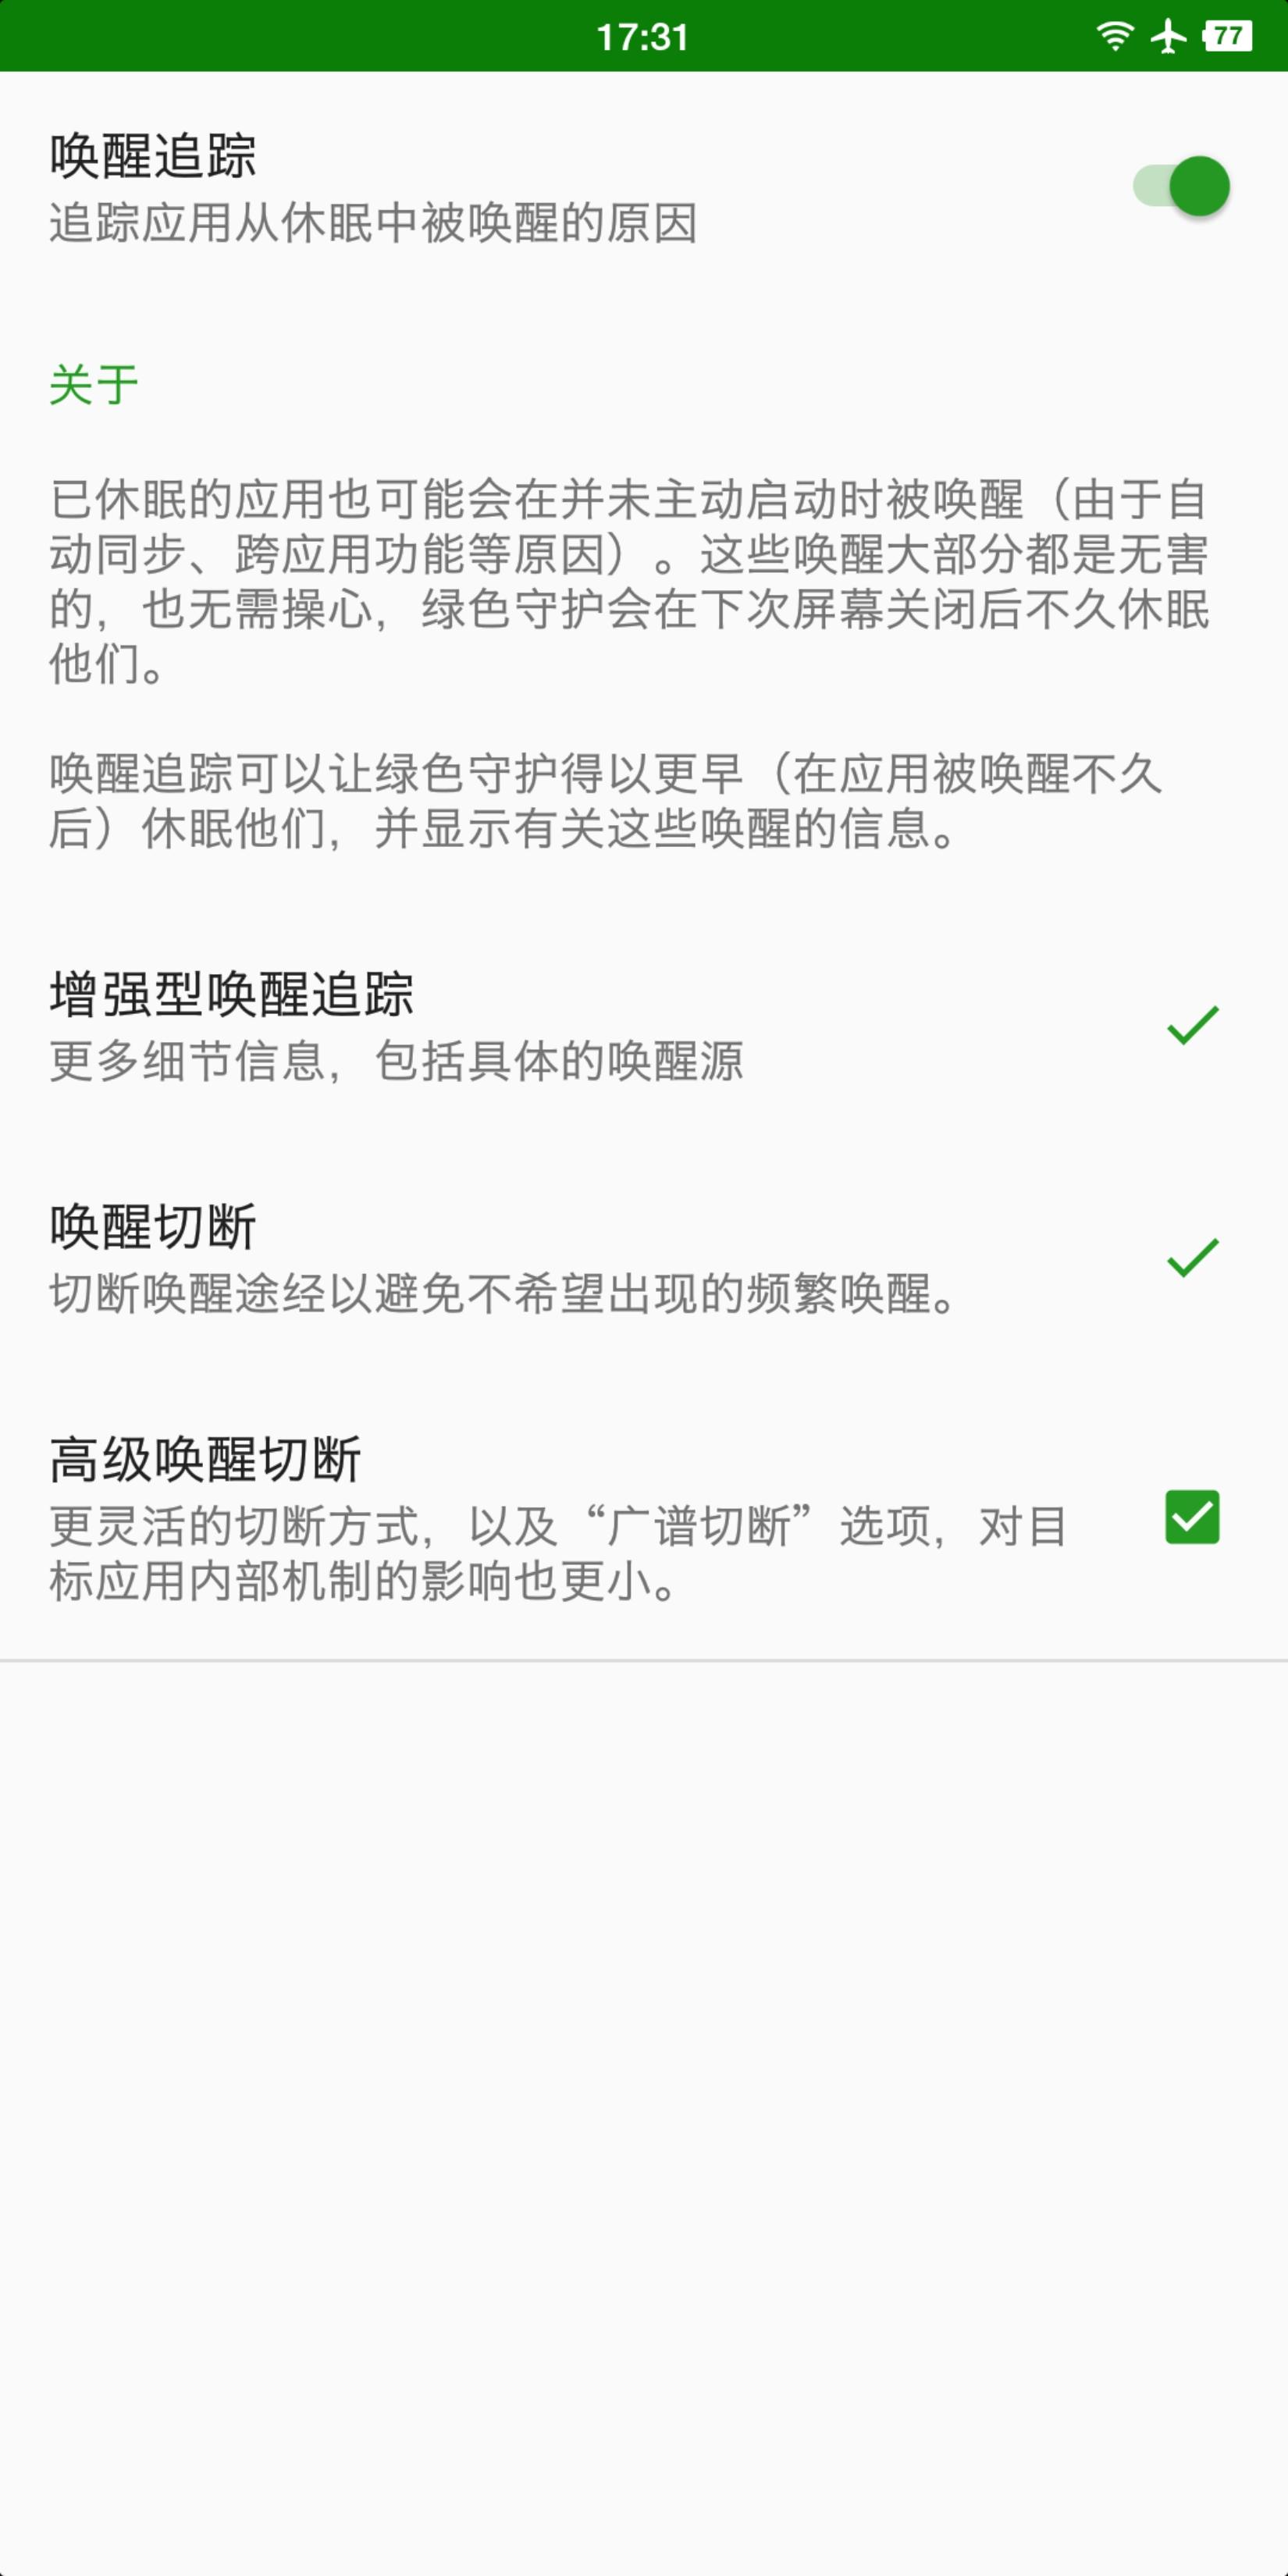 Screenshot_2019-10-03-17-31-03-077_????.png